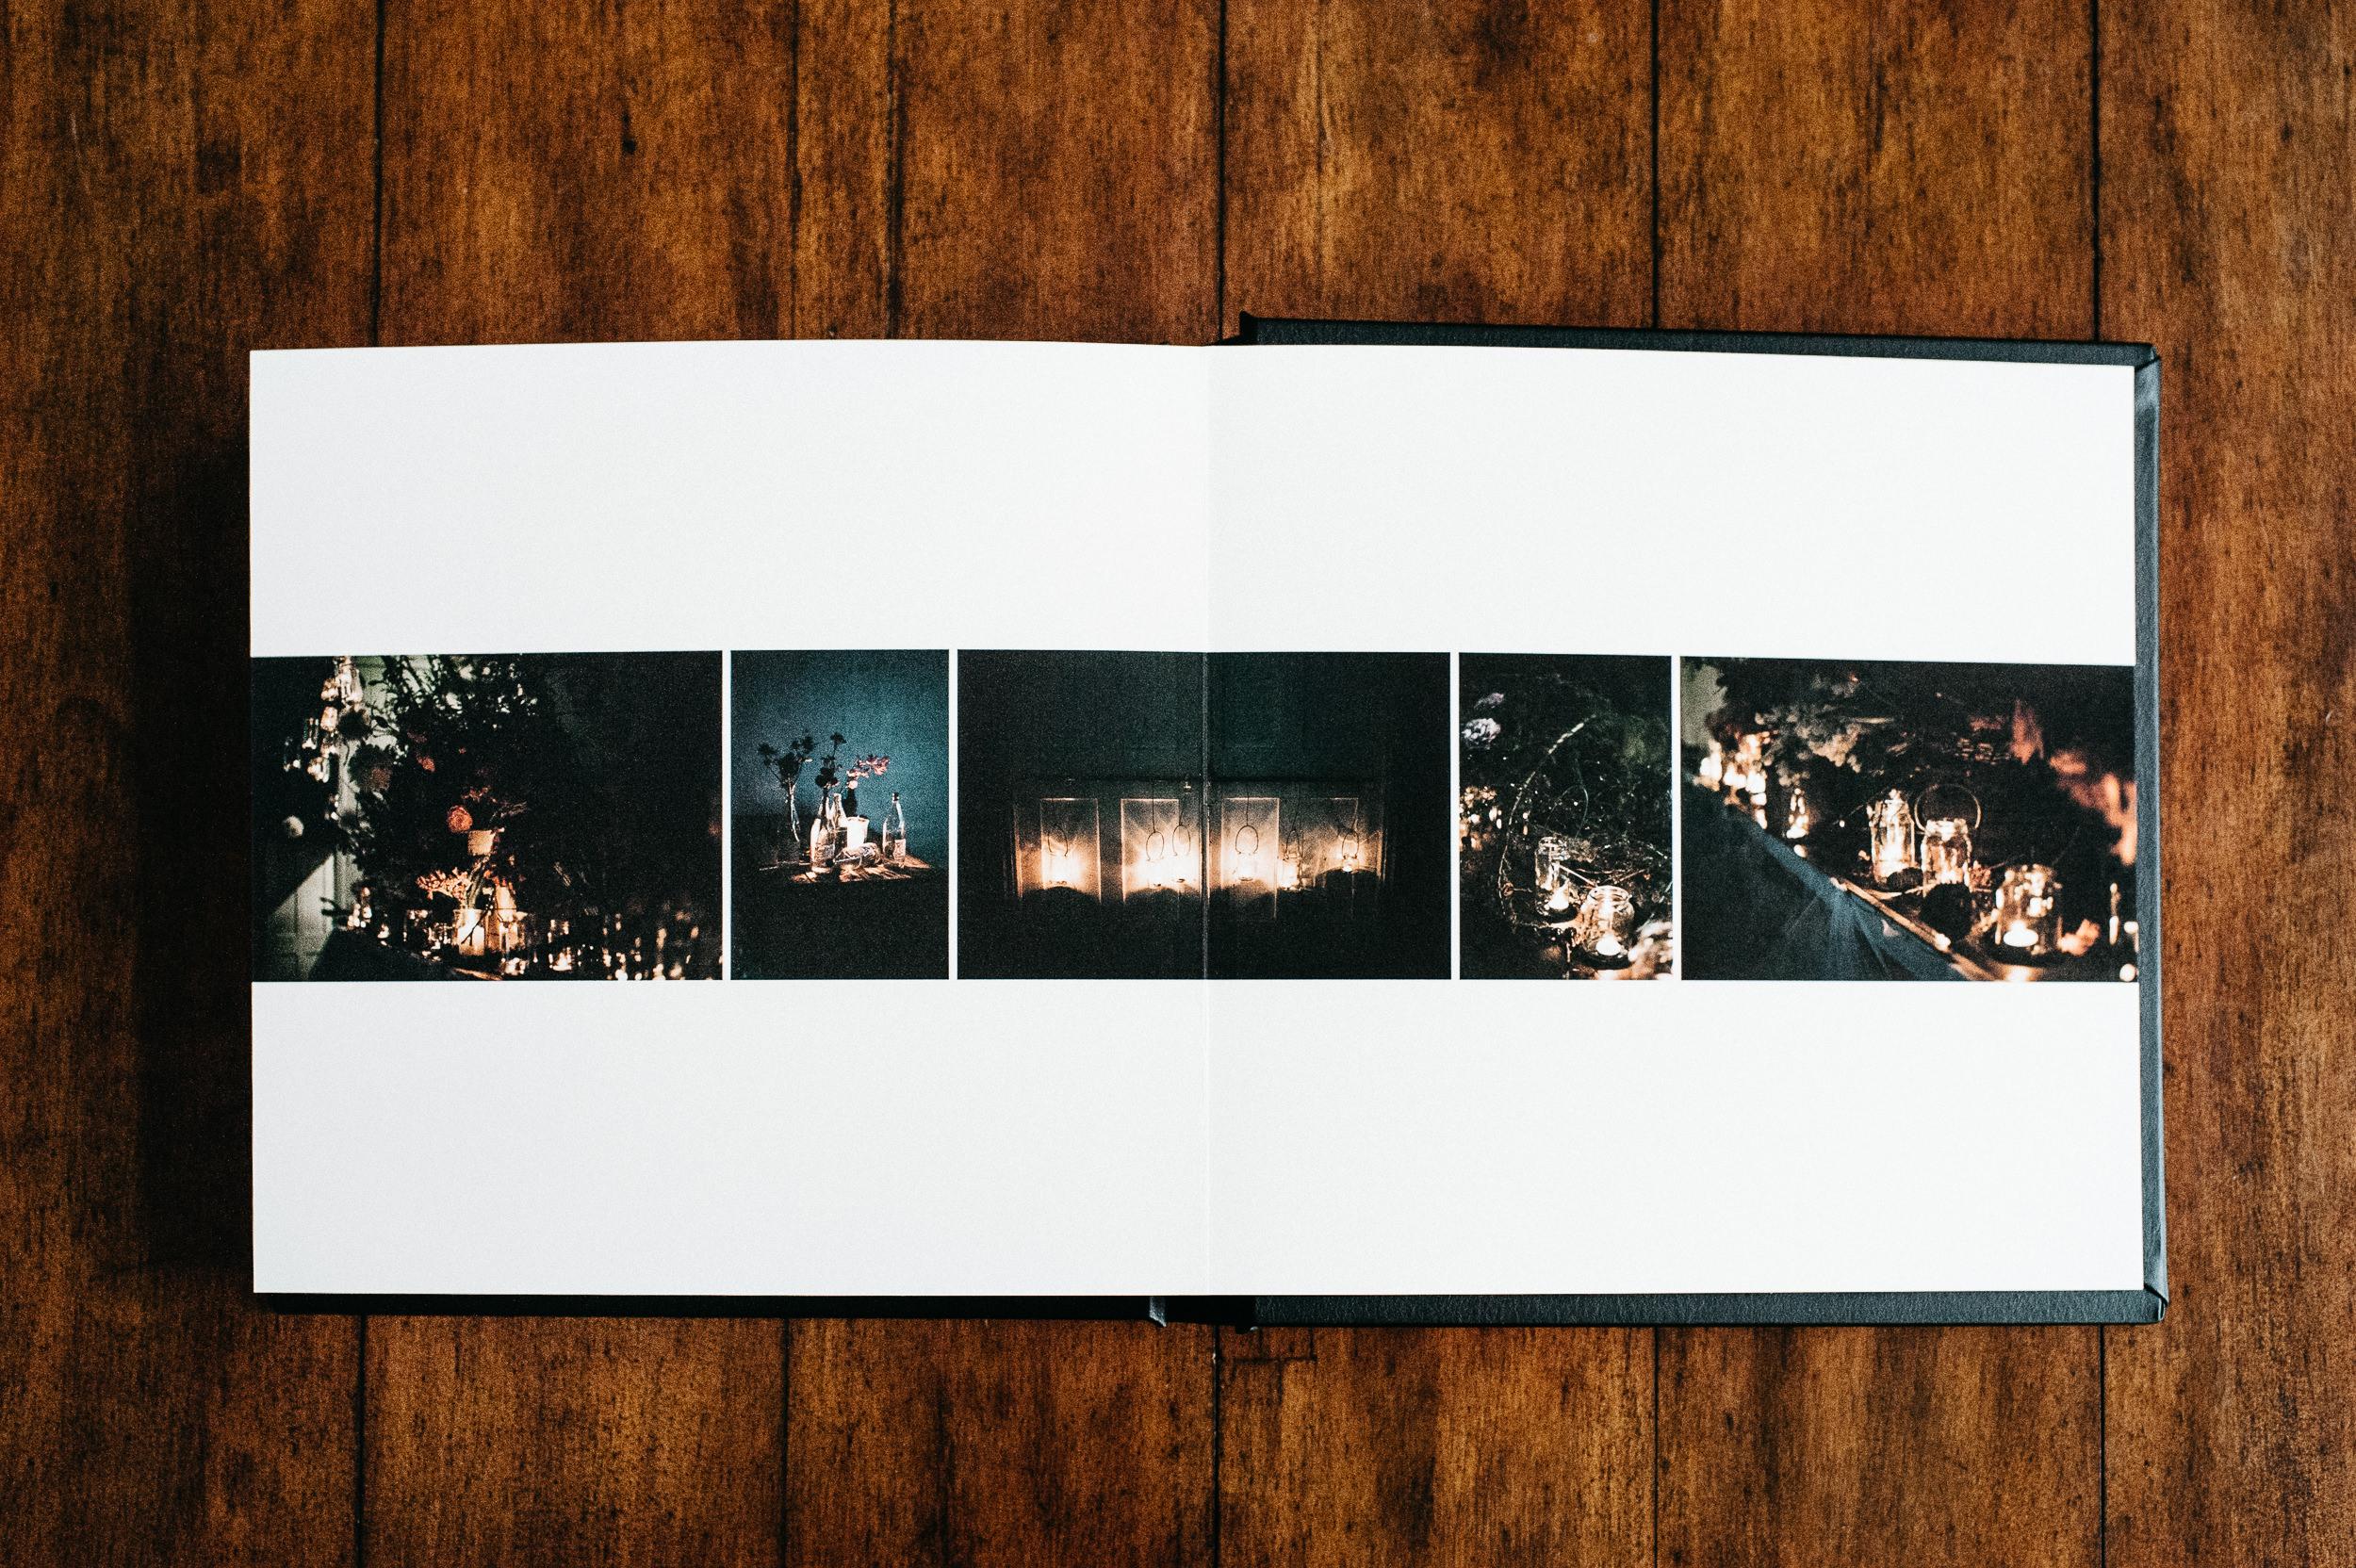 Canberra-wedding-photographer-lauren-campbell-wedding-album-3